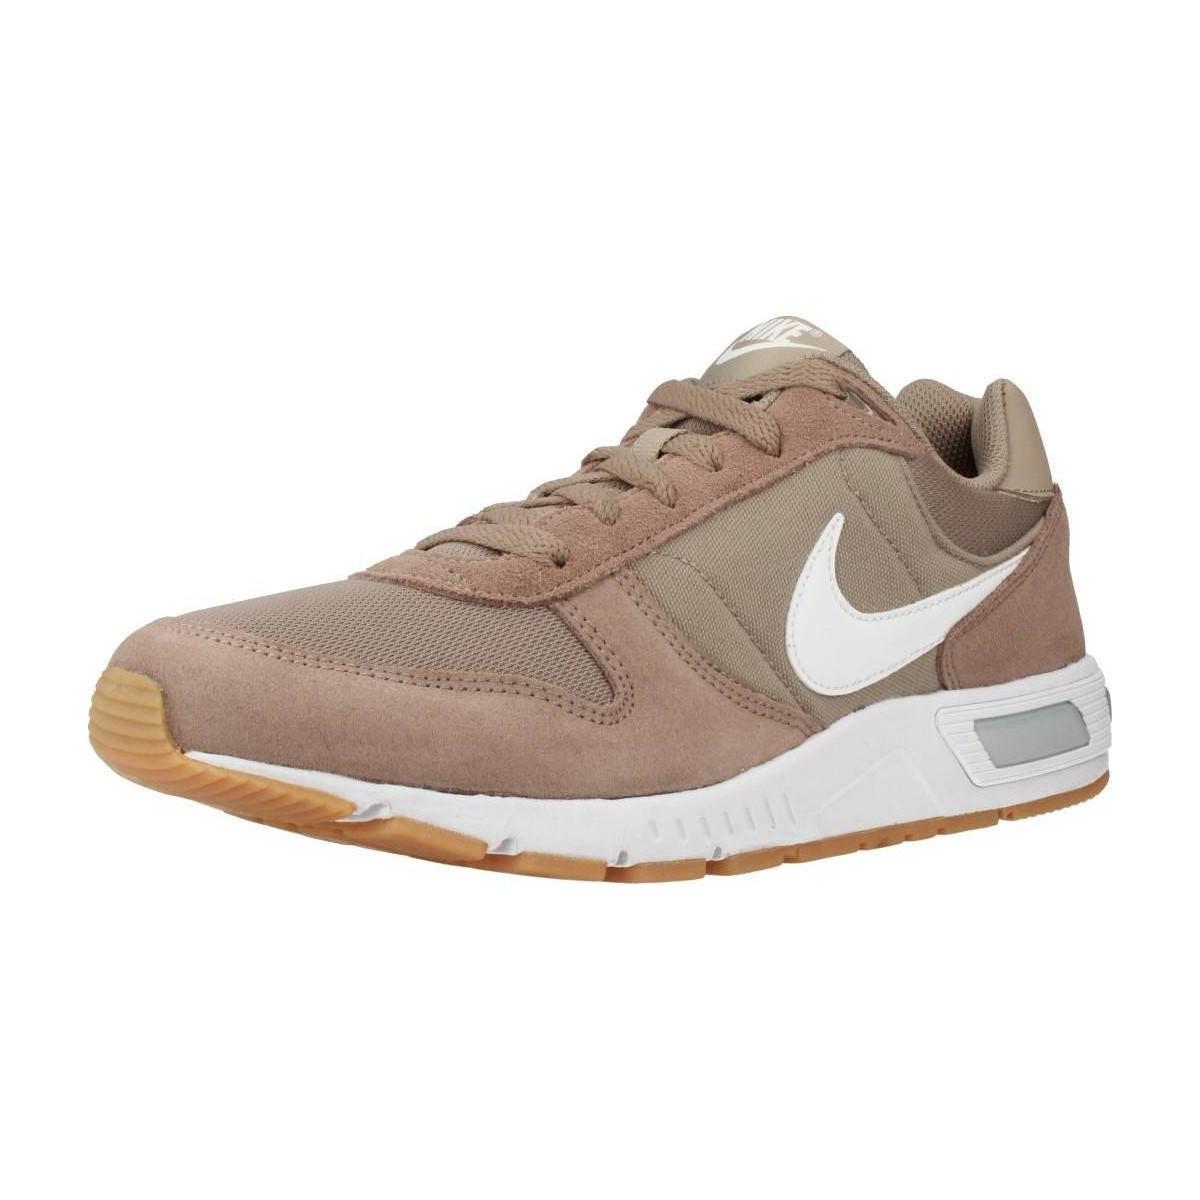 Nike. Nightgazer Men's Shoes ...